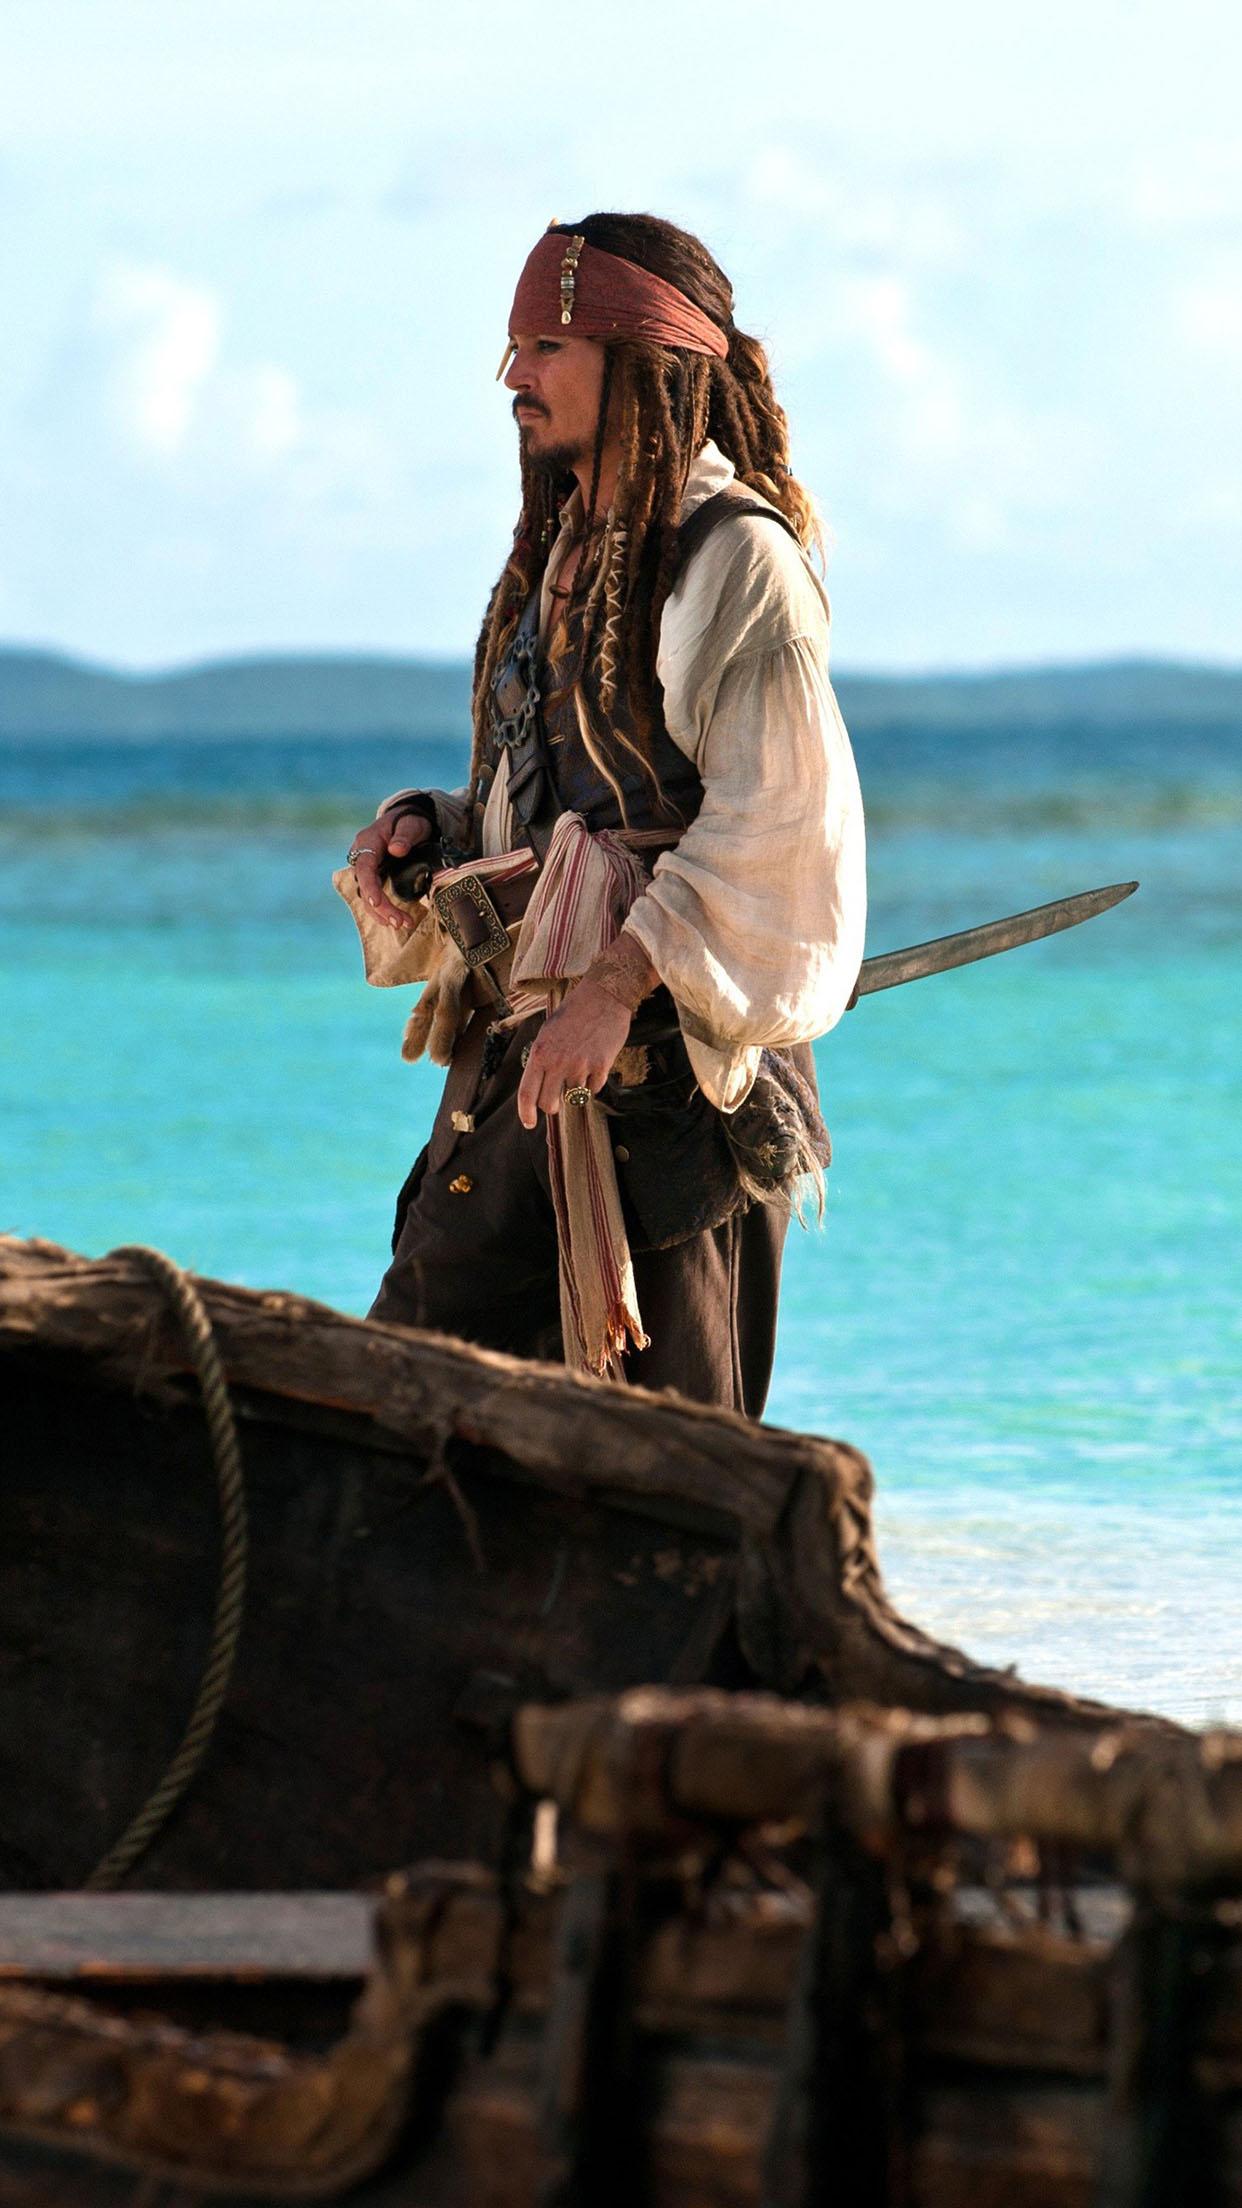 Captain Jack Sparrow Captain Jack Sparrow 2 3Wallpapers iPhone Parallax Captain Jack Sparrow 2